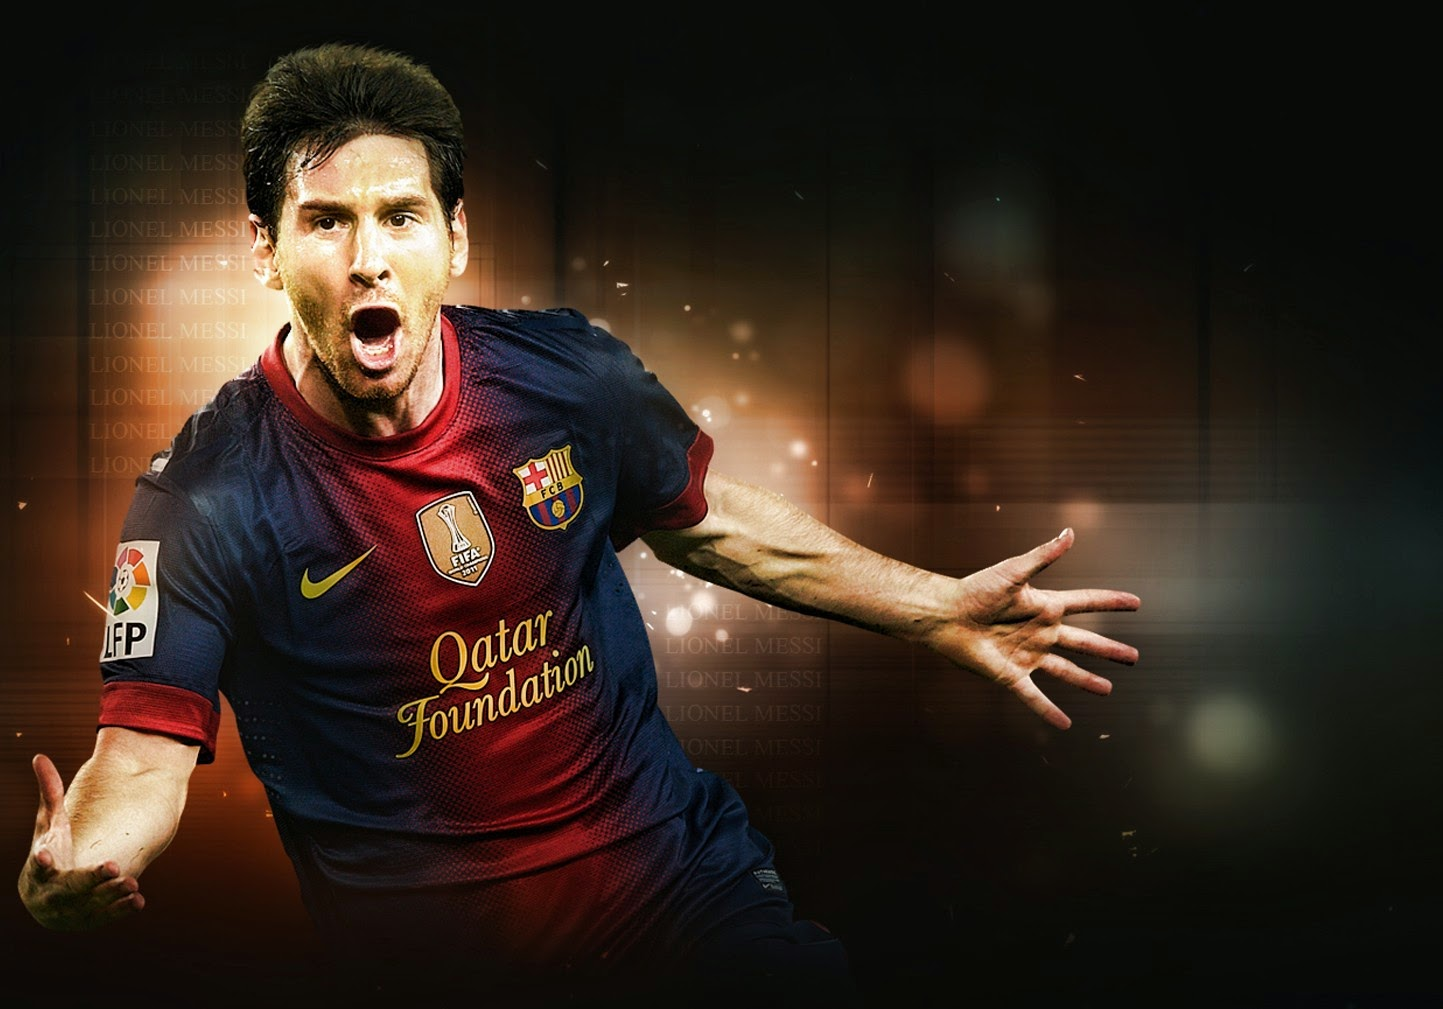 Lionel Messi HD Wallpapers Download High Definition Desktop 1443x1009